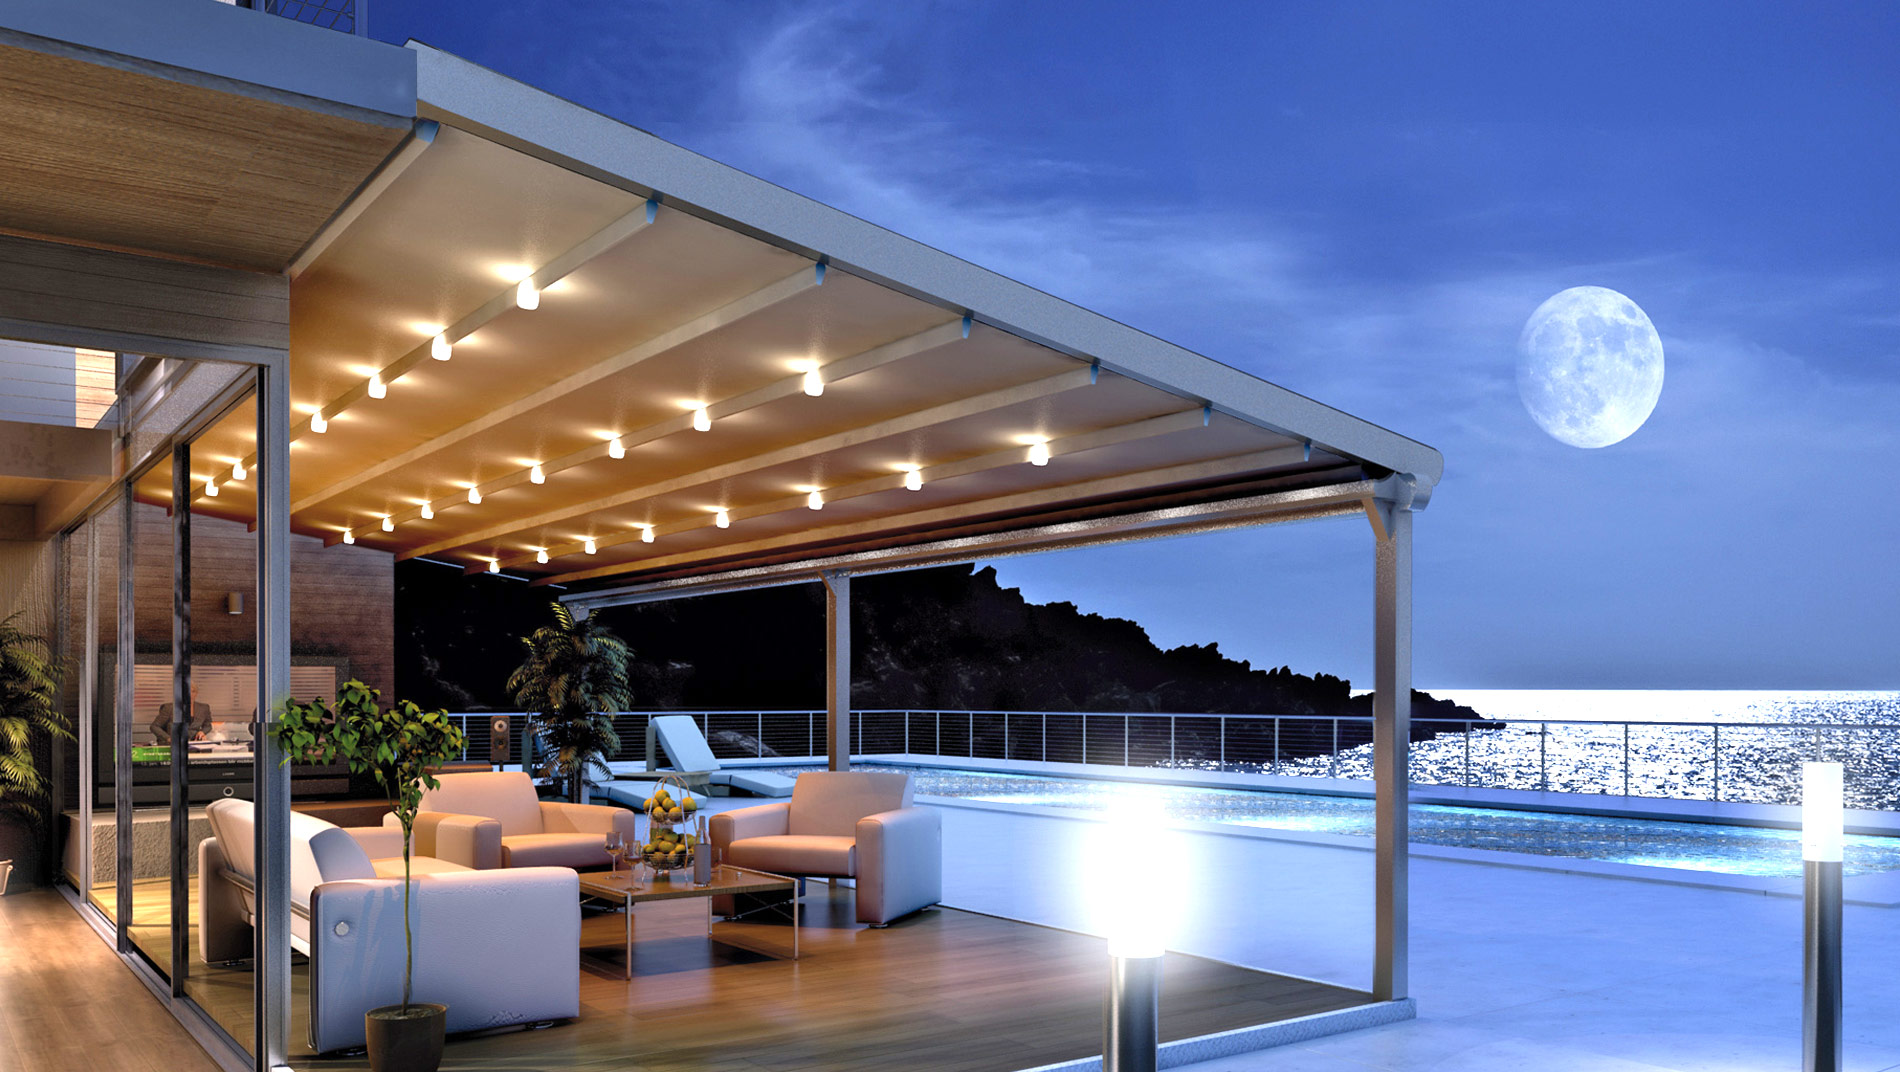 Toldoastur toldos de fachada y terraza asturias for Toldo lateral para terraza